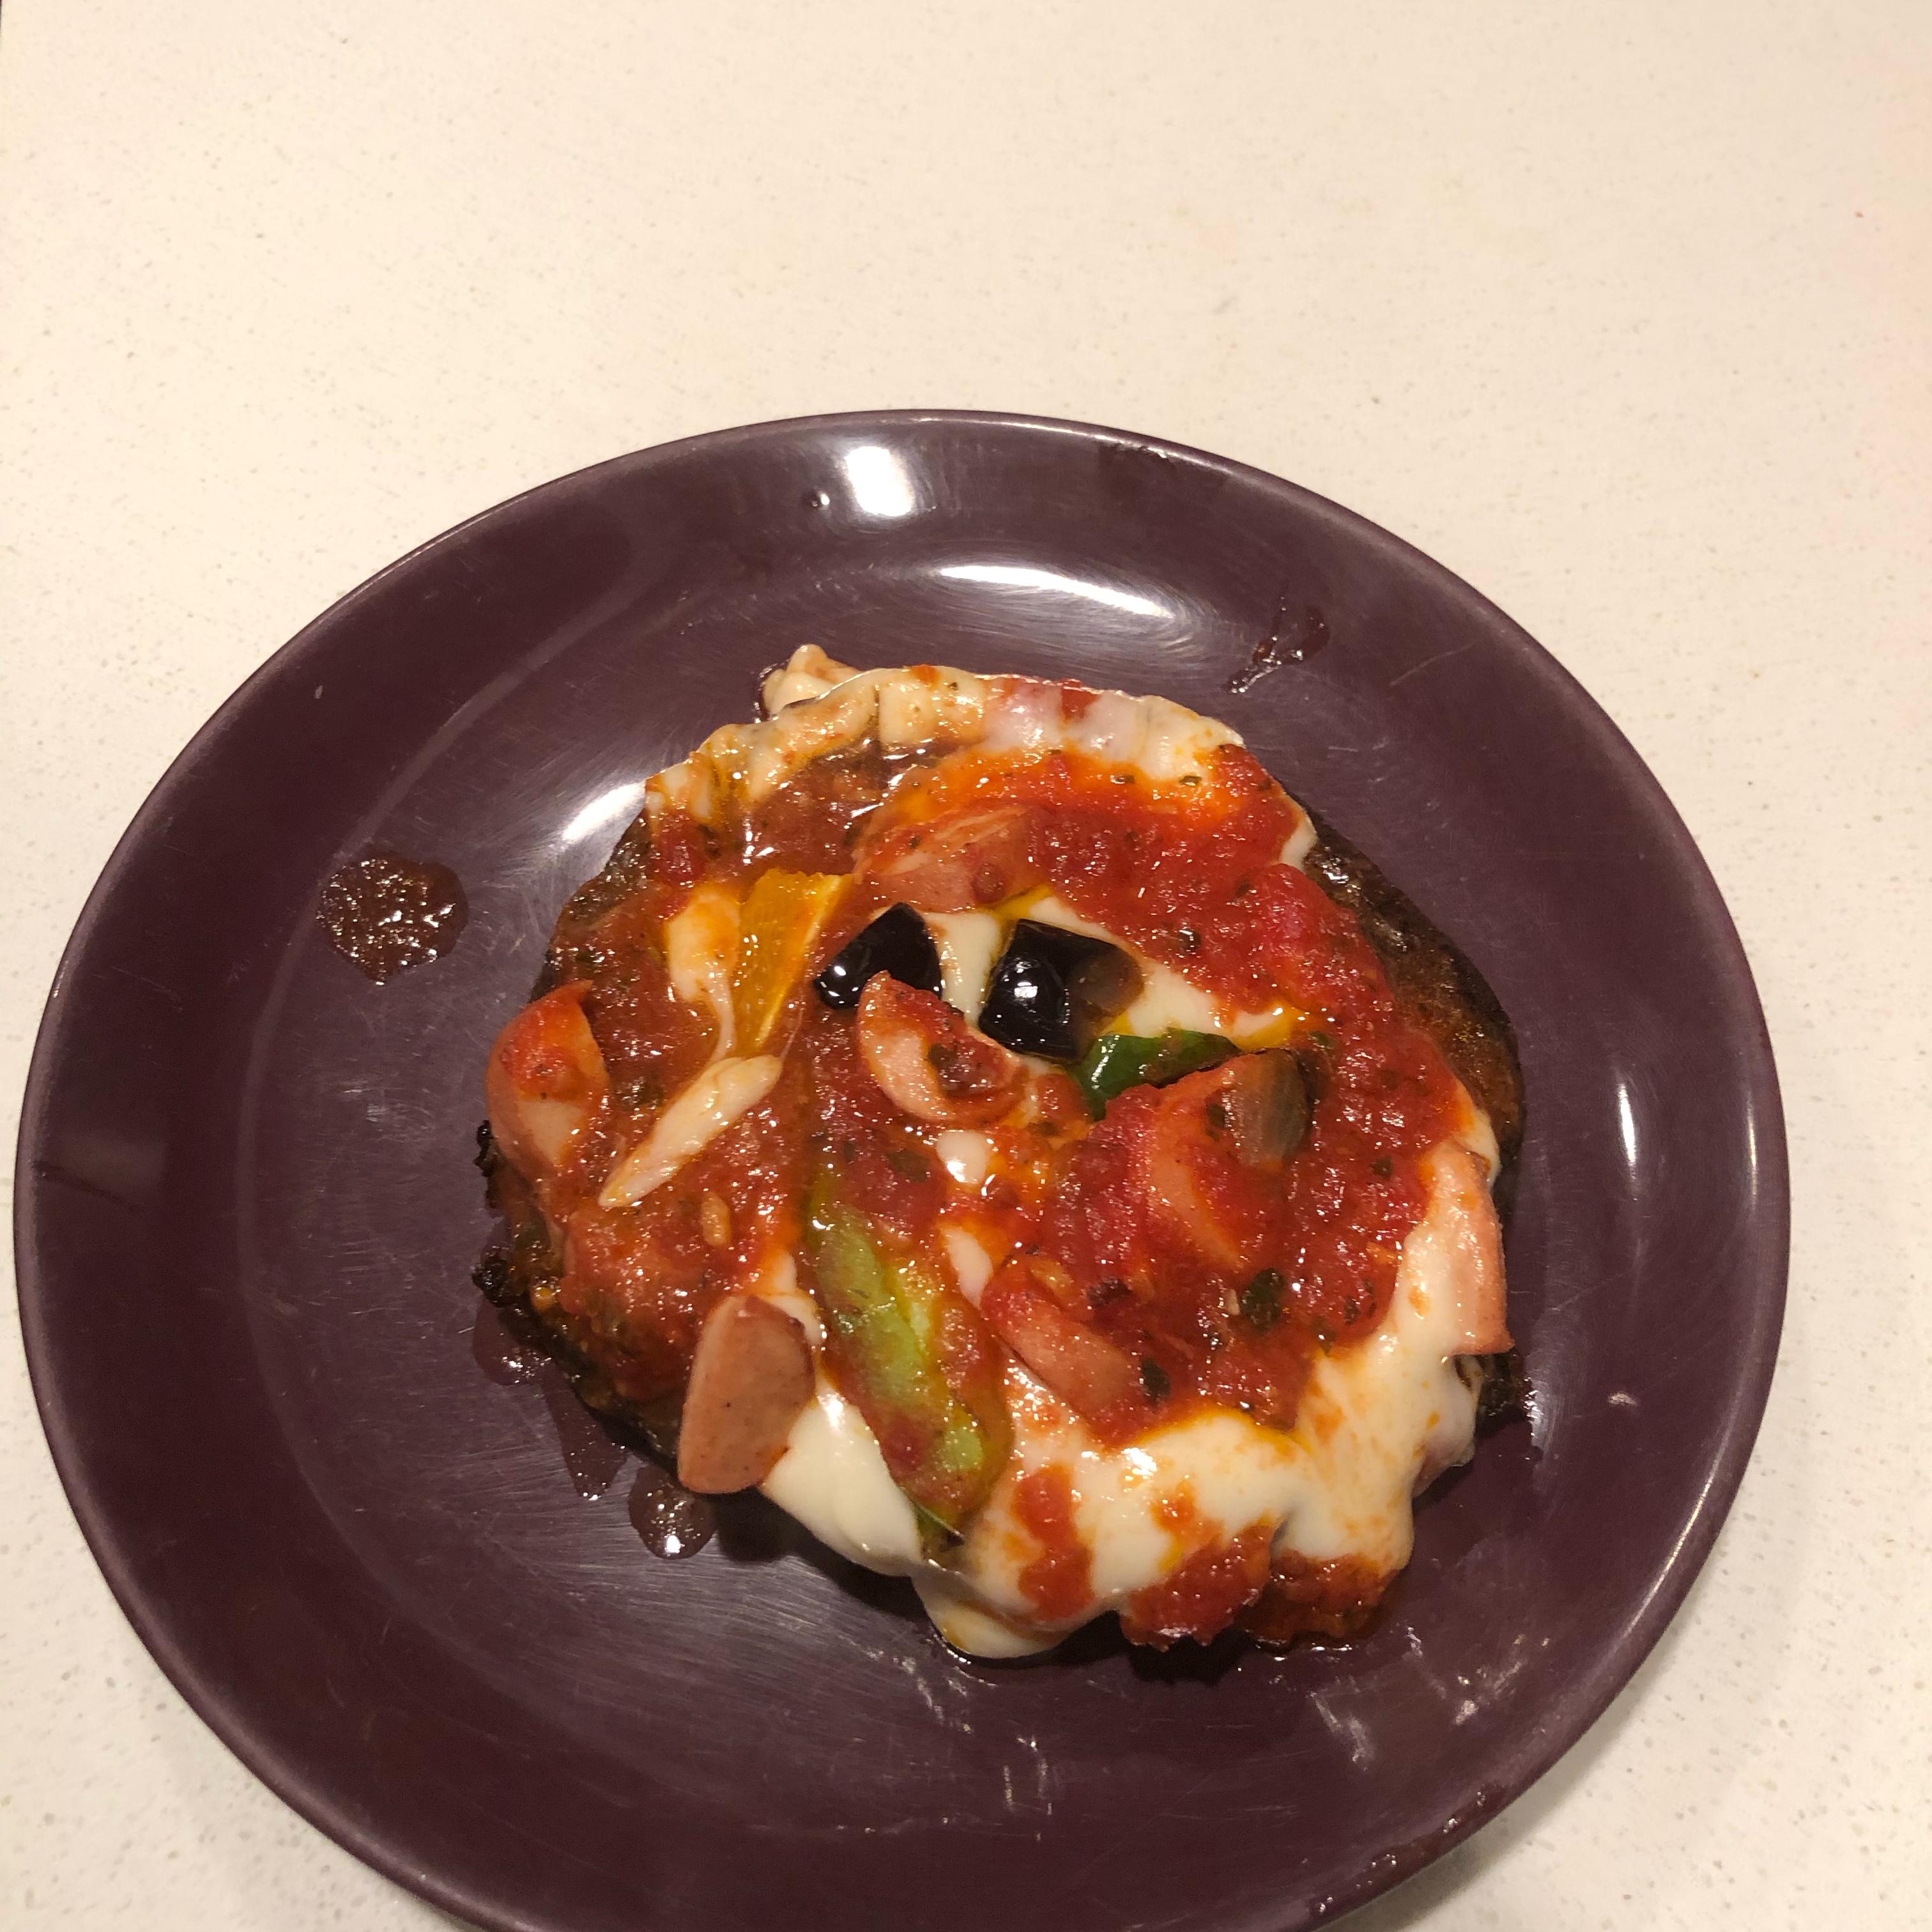 Pizza-Style Portabello Mushrooms Jennifer